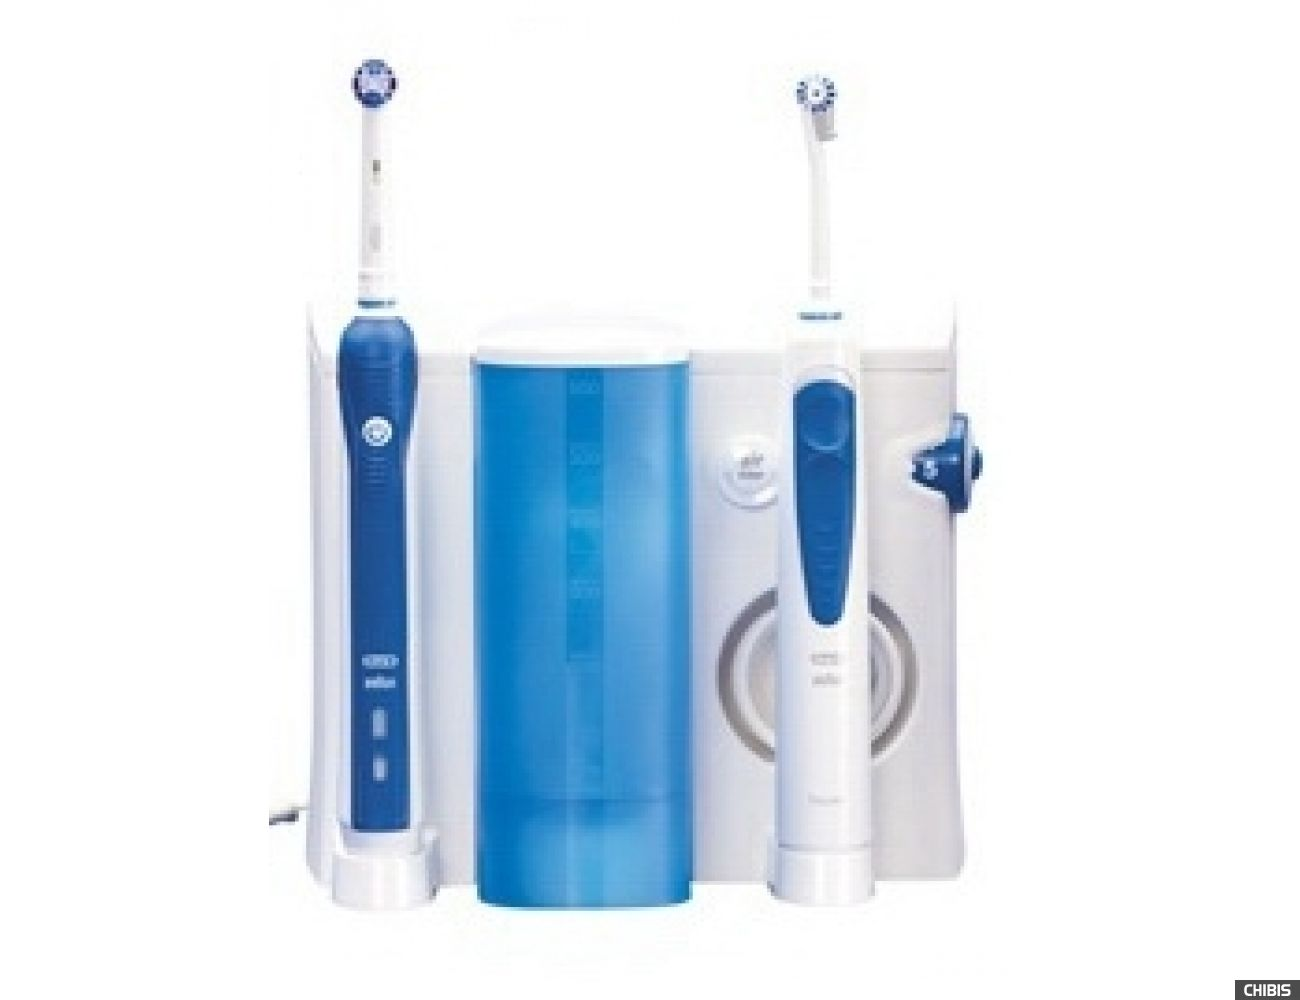 Зубной центр Braun Oral-B Professional Care 3000 DLX OxyJet (OC 20.545.3X) 4210201377818